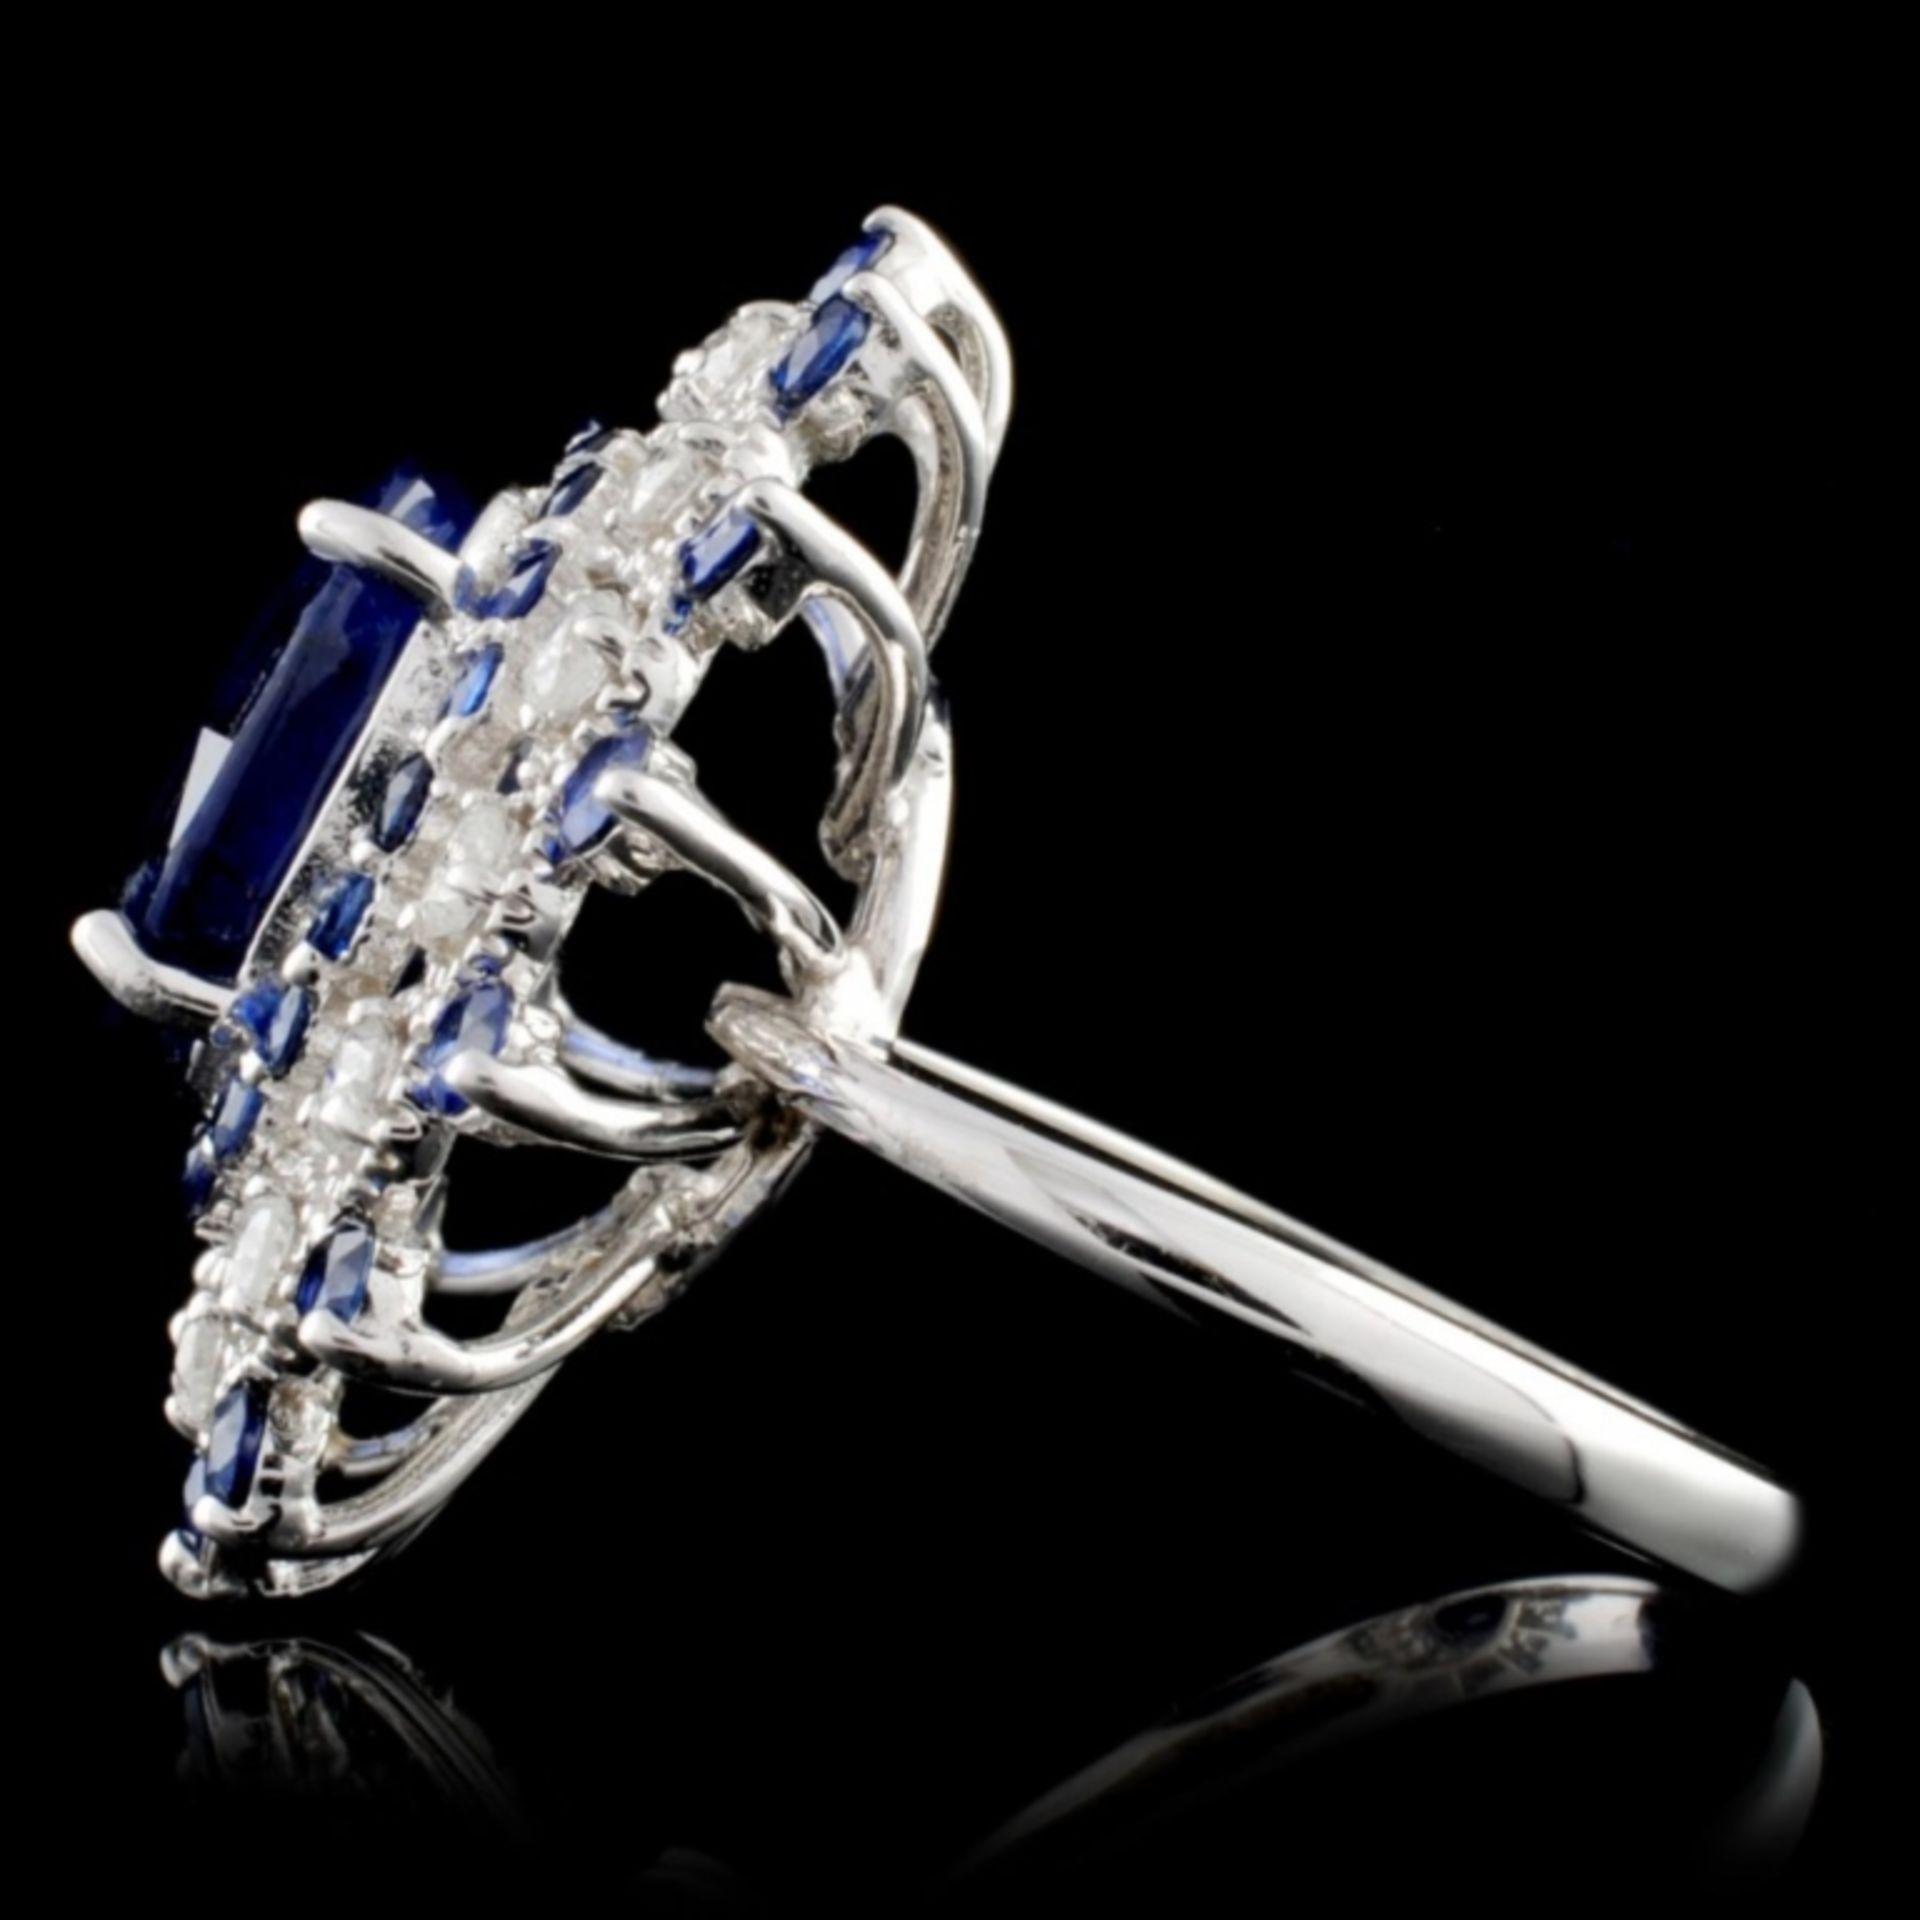 14K White Gold 7.50ct Sapphire & 1ct Diamond Ring - Image 3 of 4